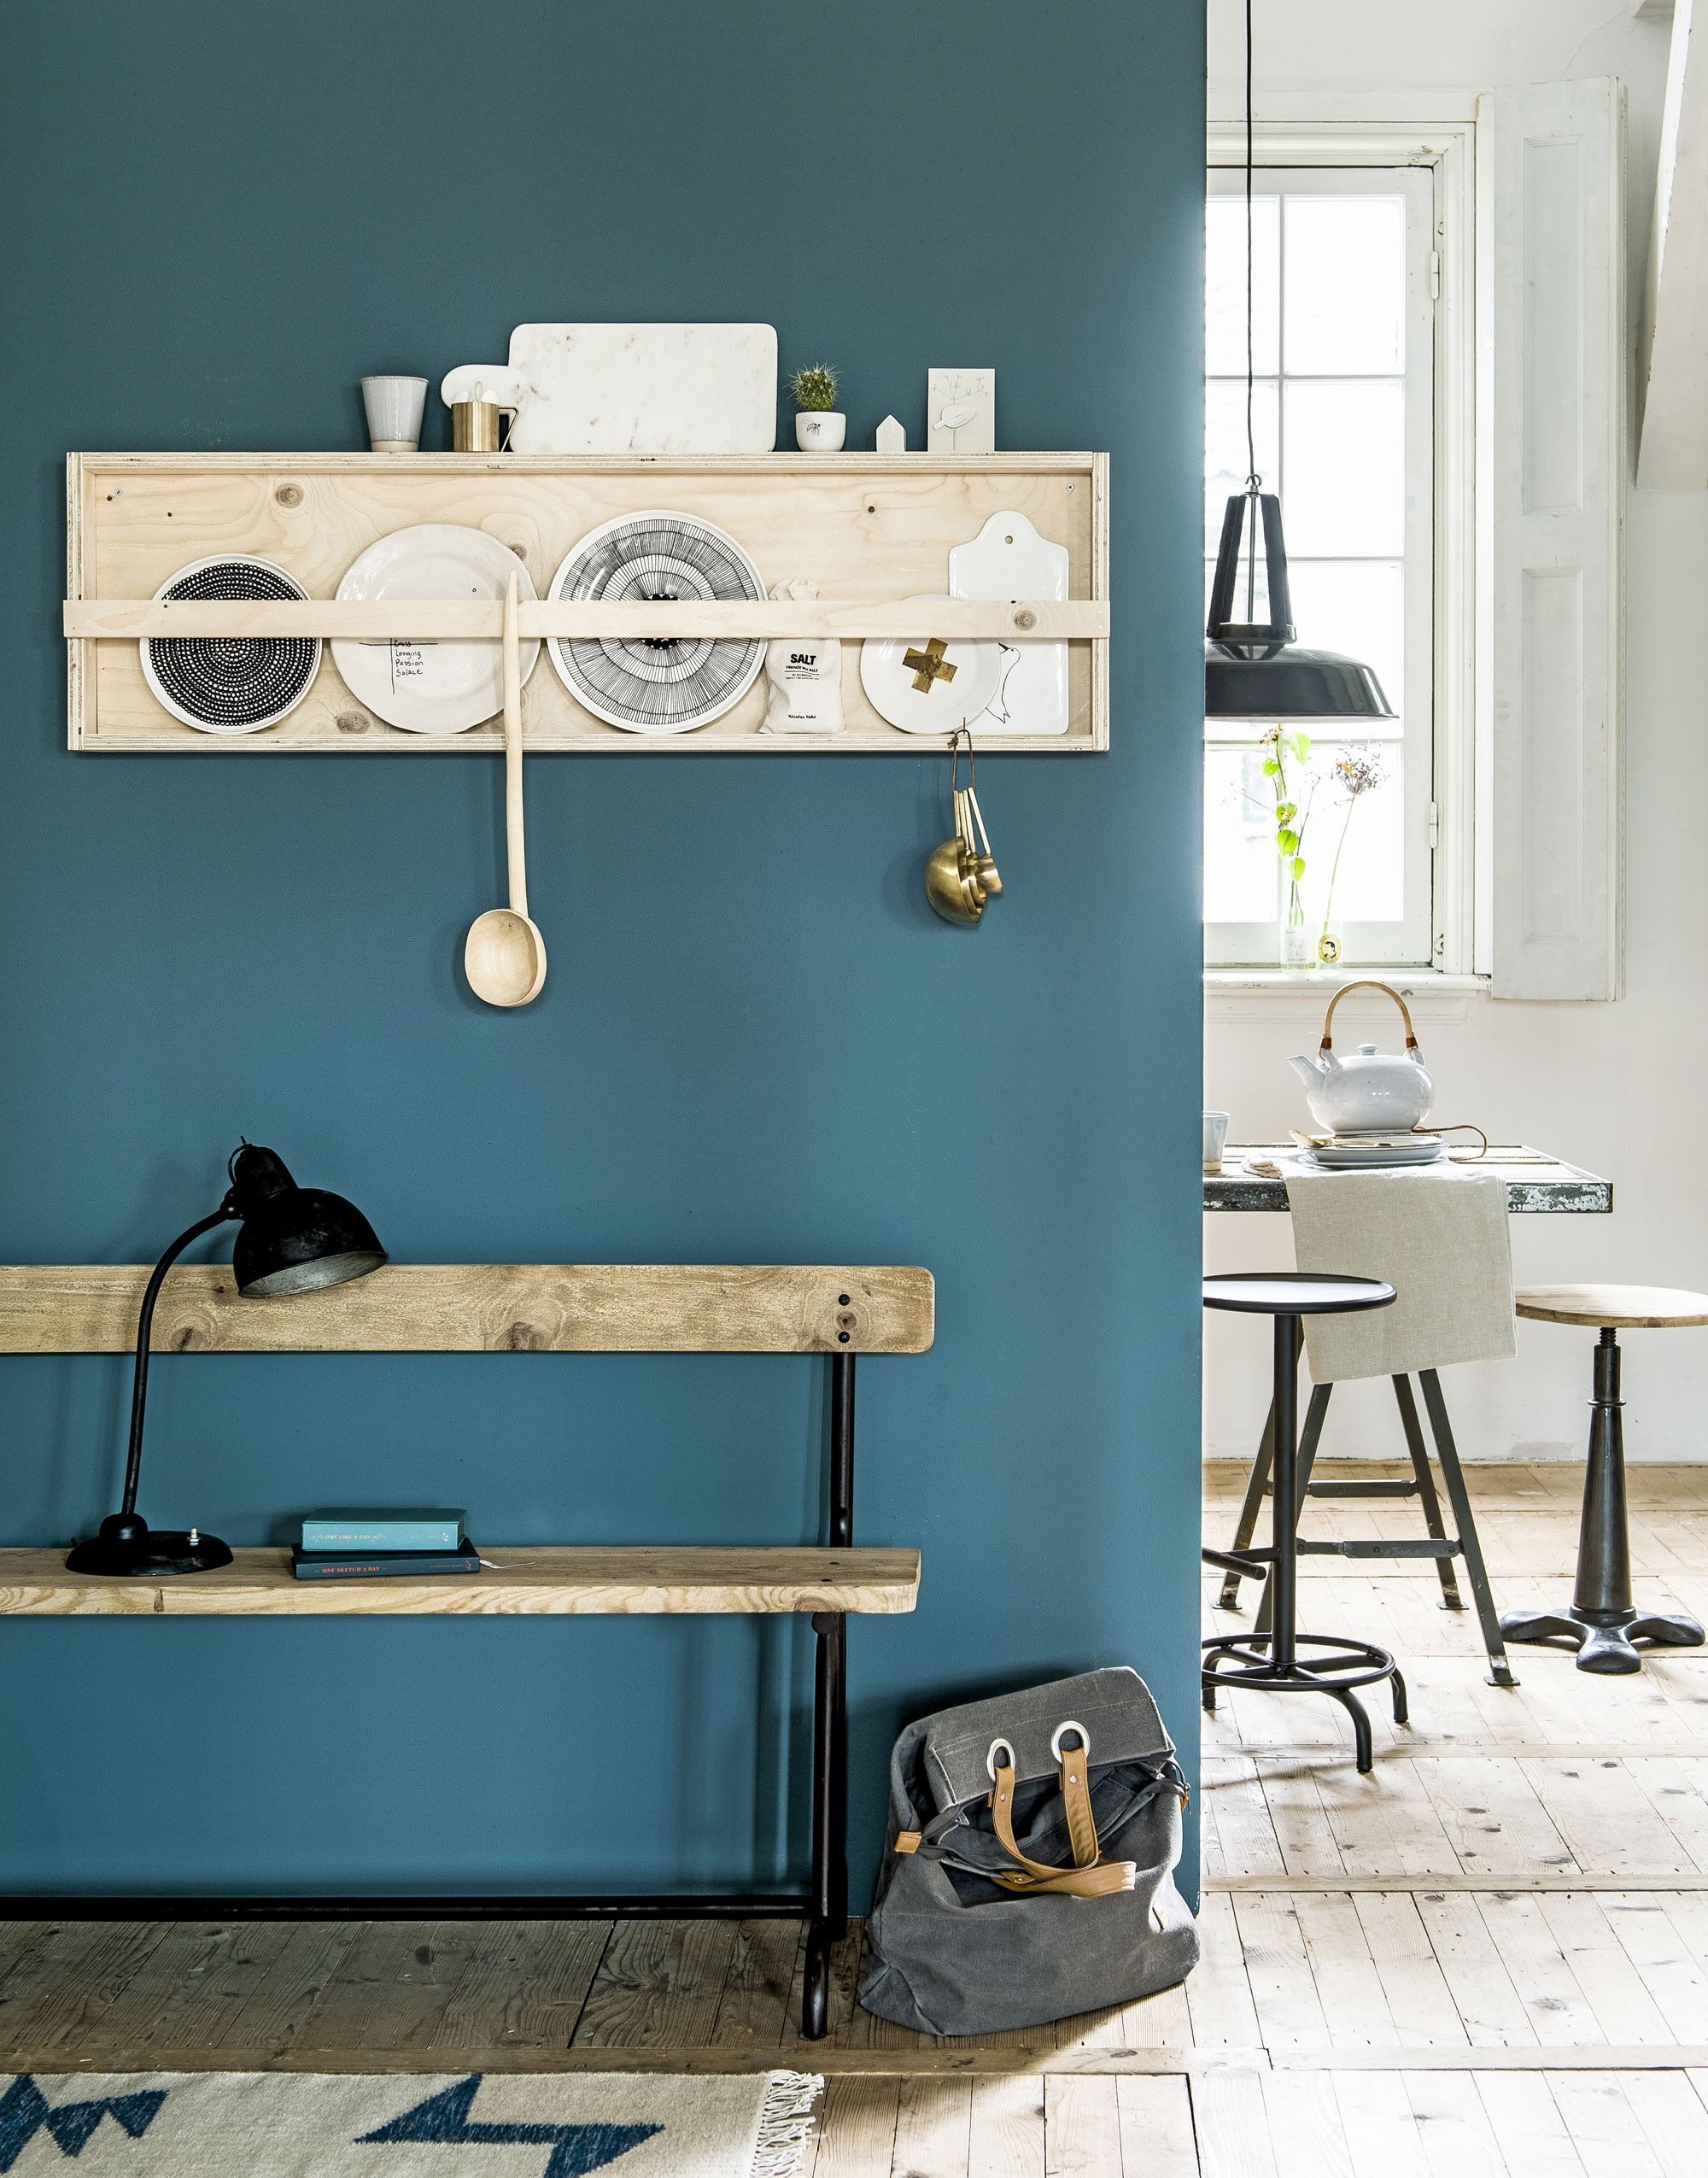 petrol blue vtwonen - Google zoeken - woonkamer | Pinterest - Borden ...